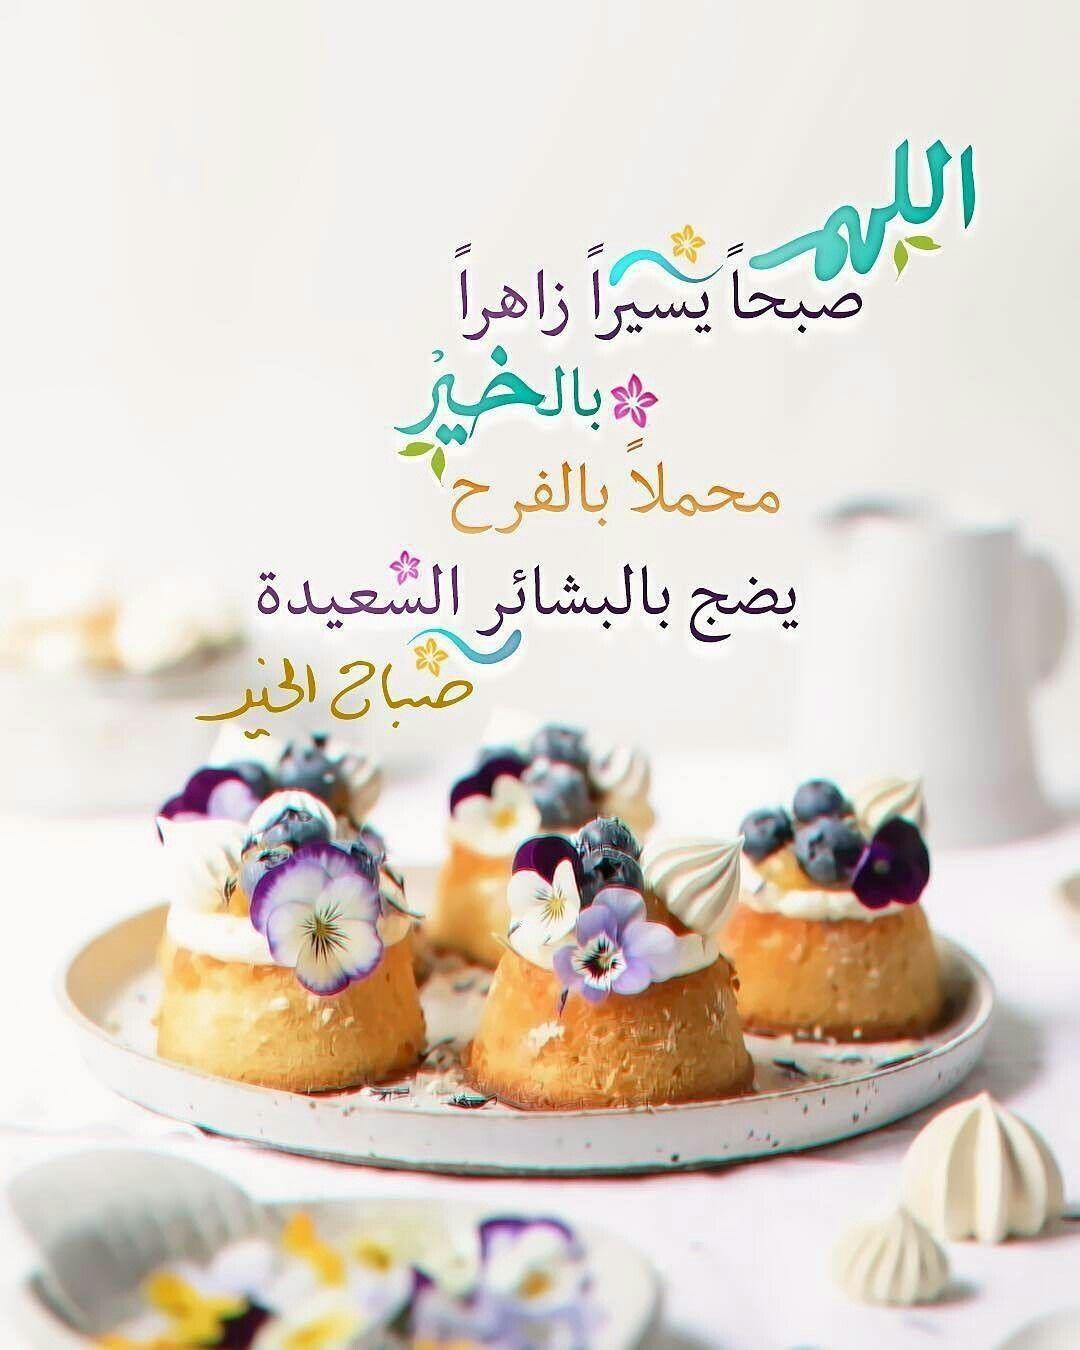 آل ل ہم آمي ن ي آرب آل عآل مي ن Good Morning Arabic Bakery Morning Greetings Quotes